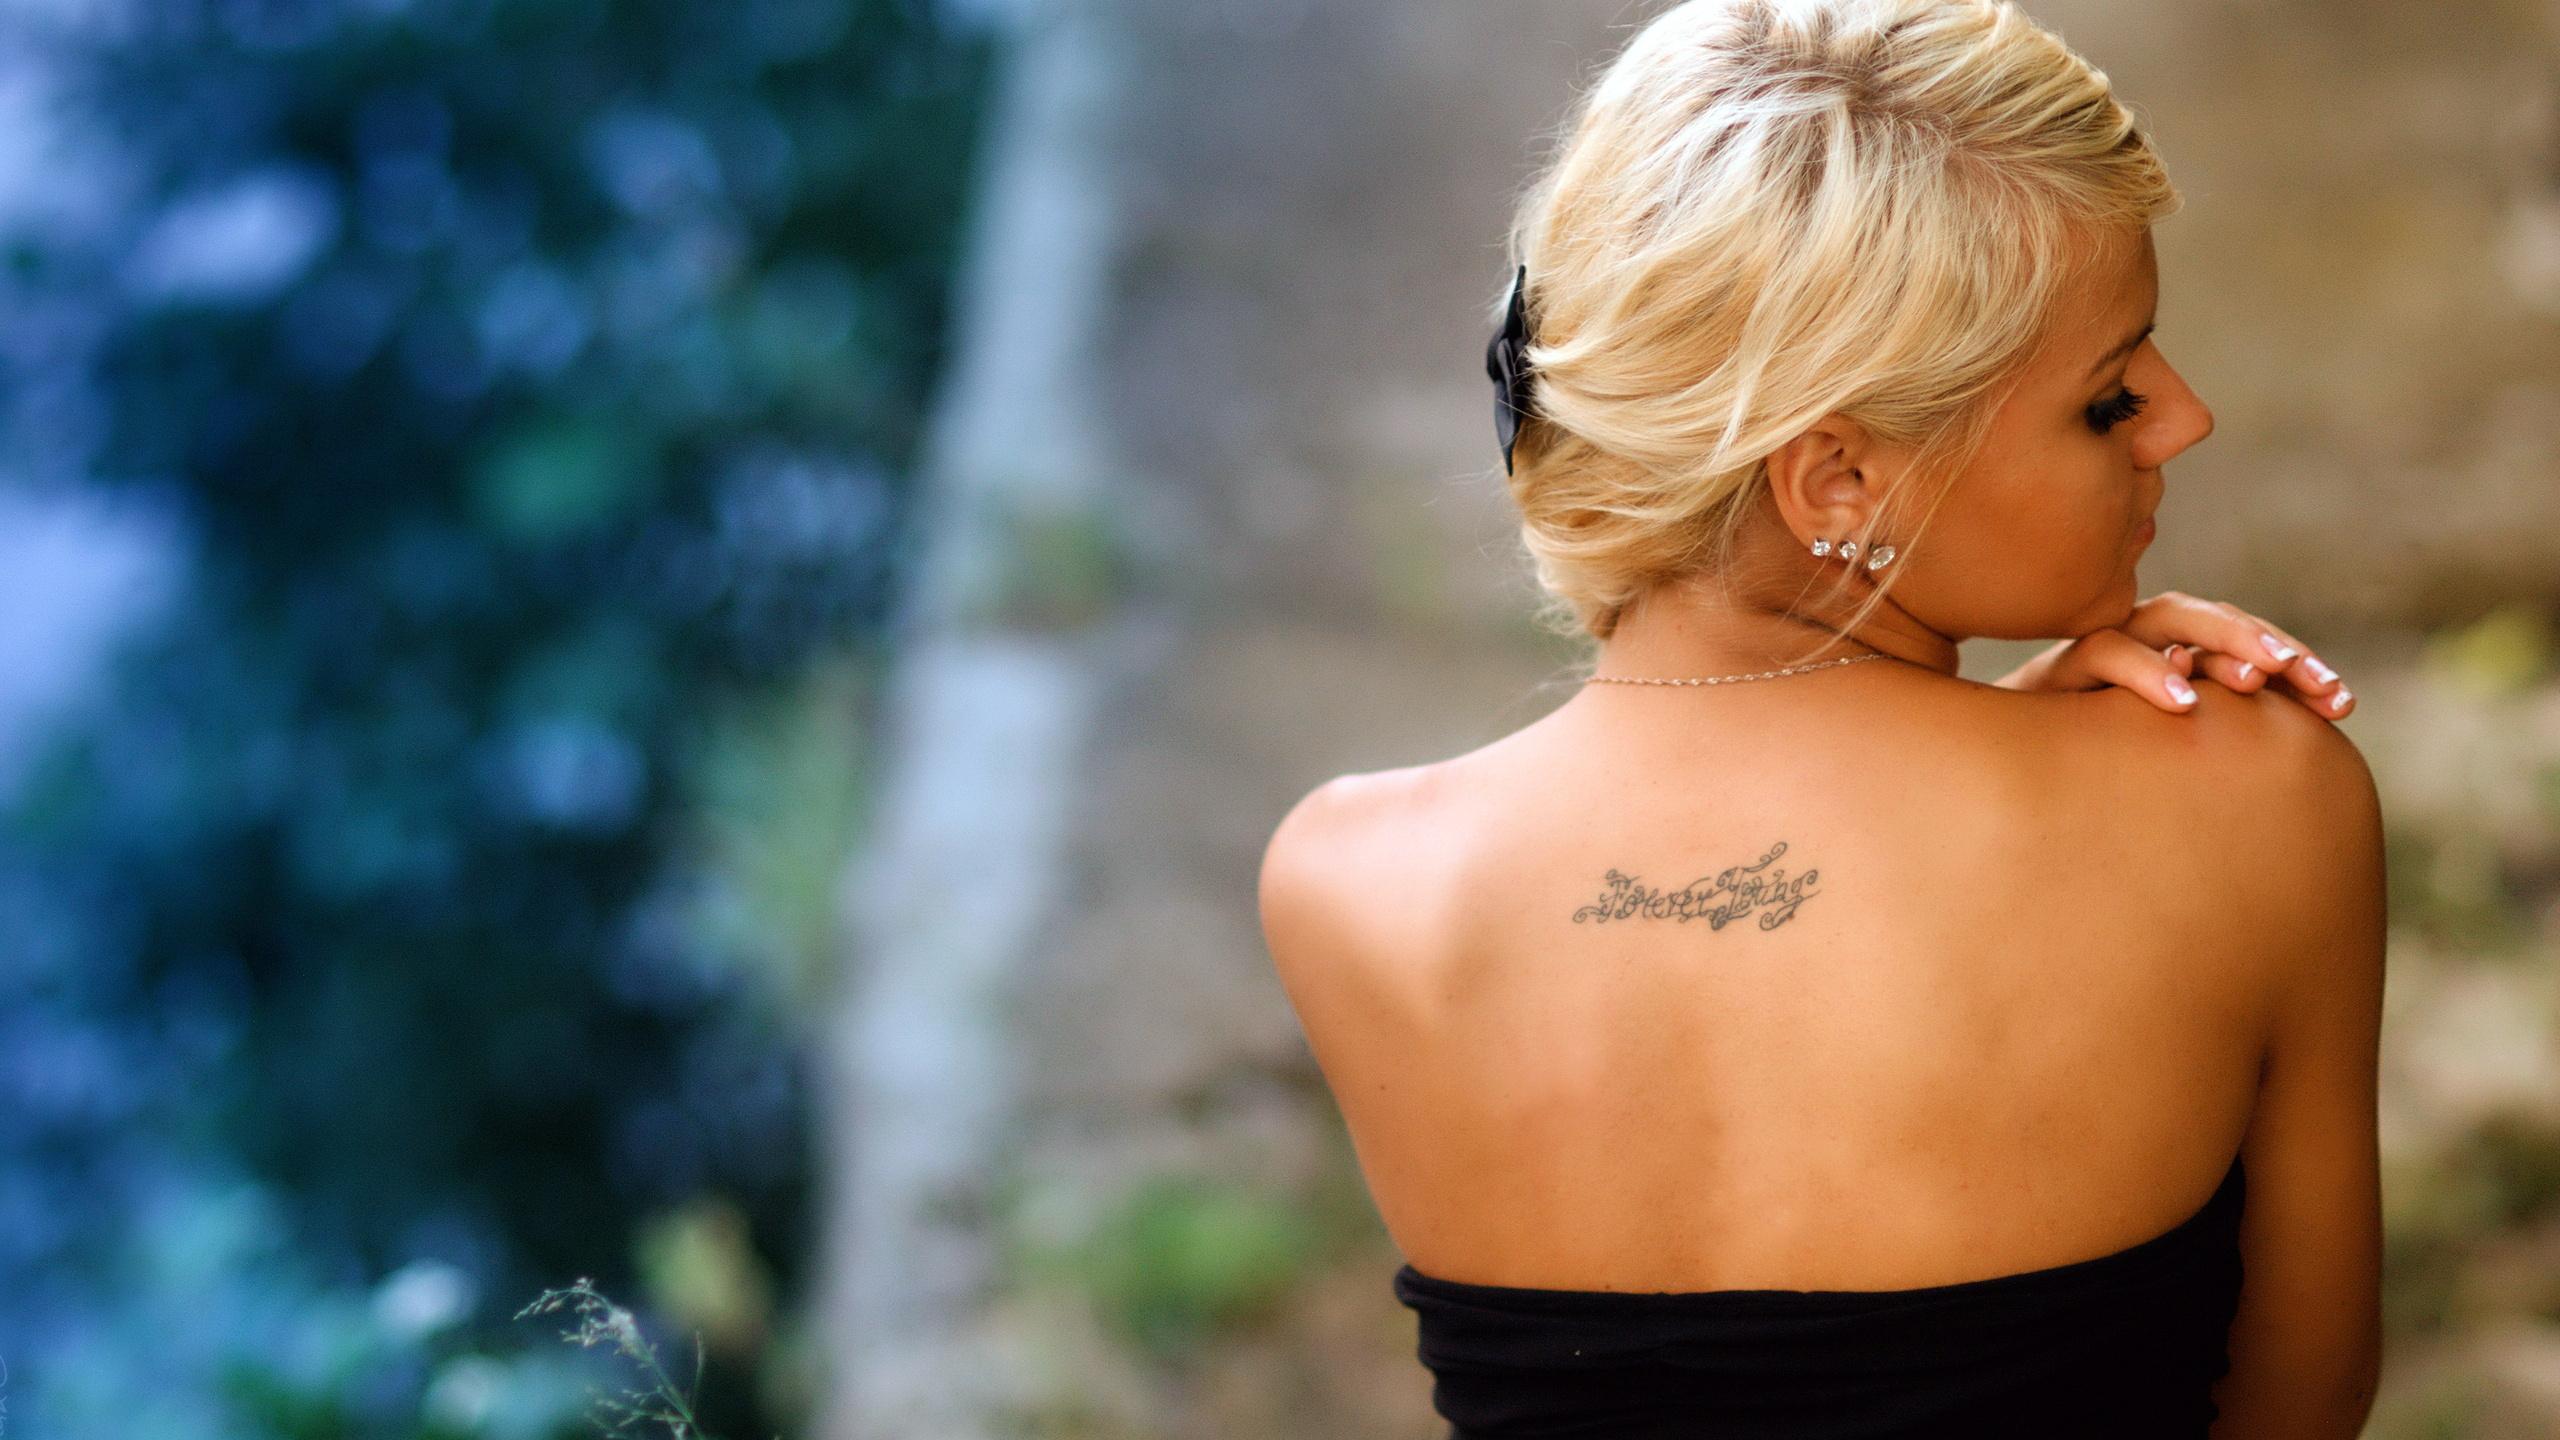 foto-grudey-blondinka-s-tatu-na-spine-foto